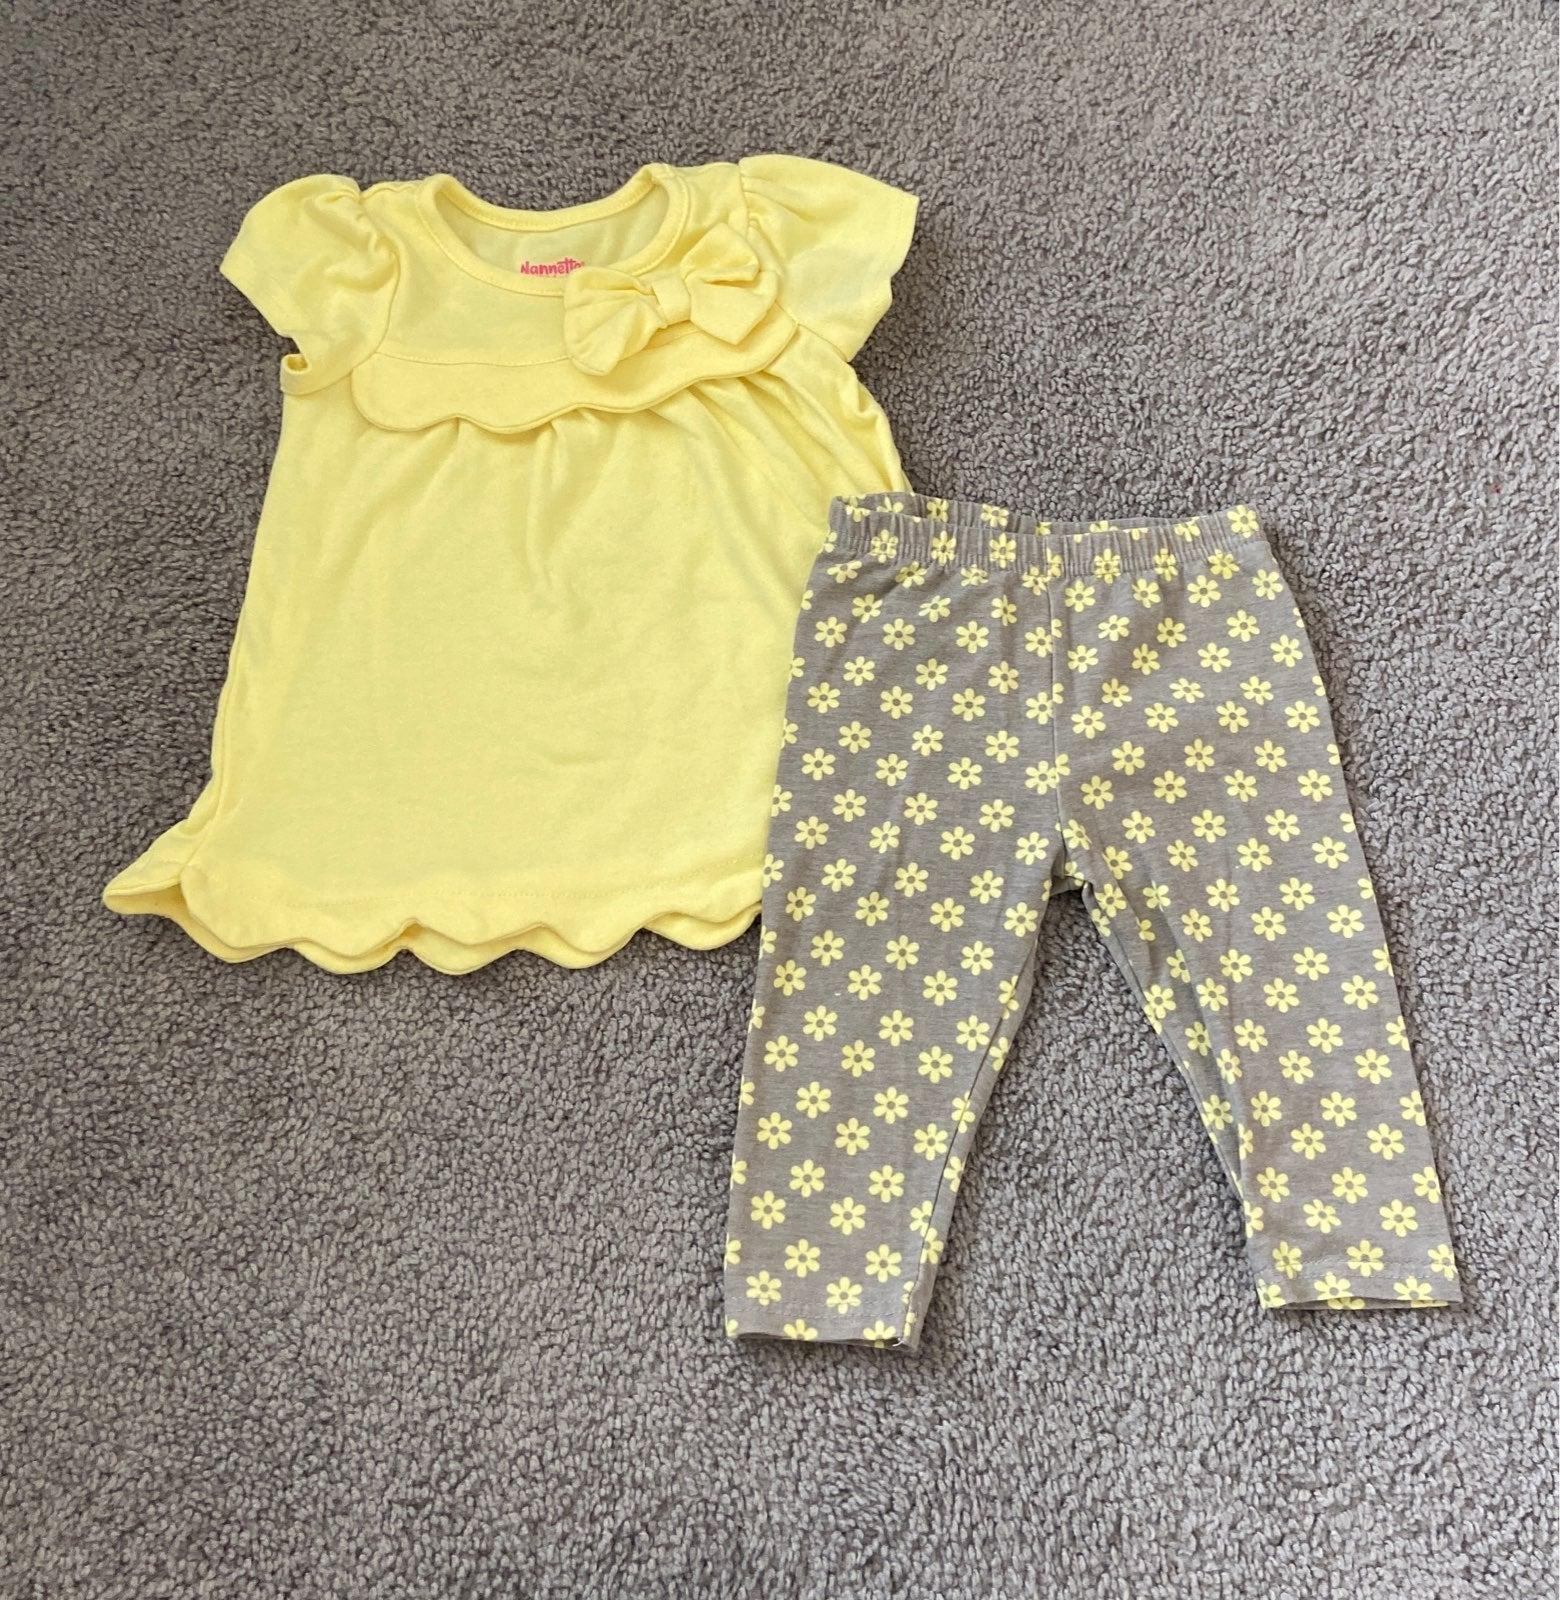 Nannette 2T Outfit